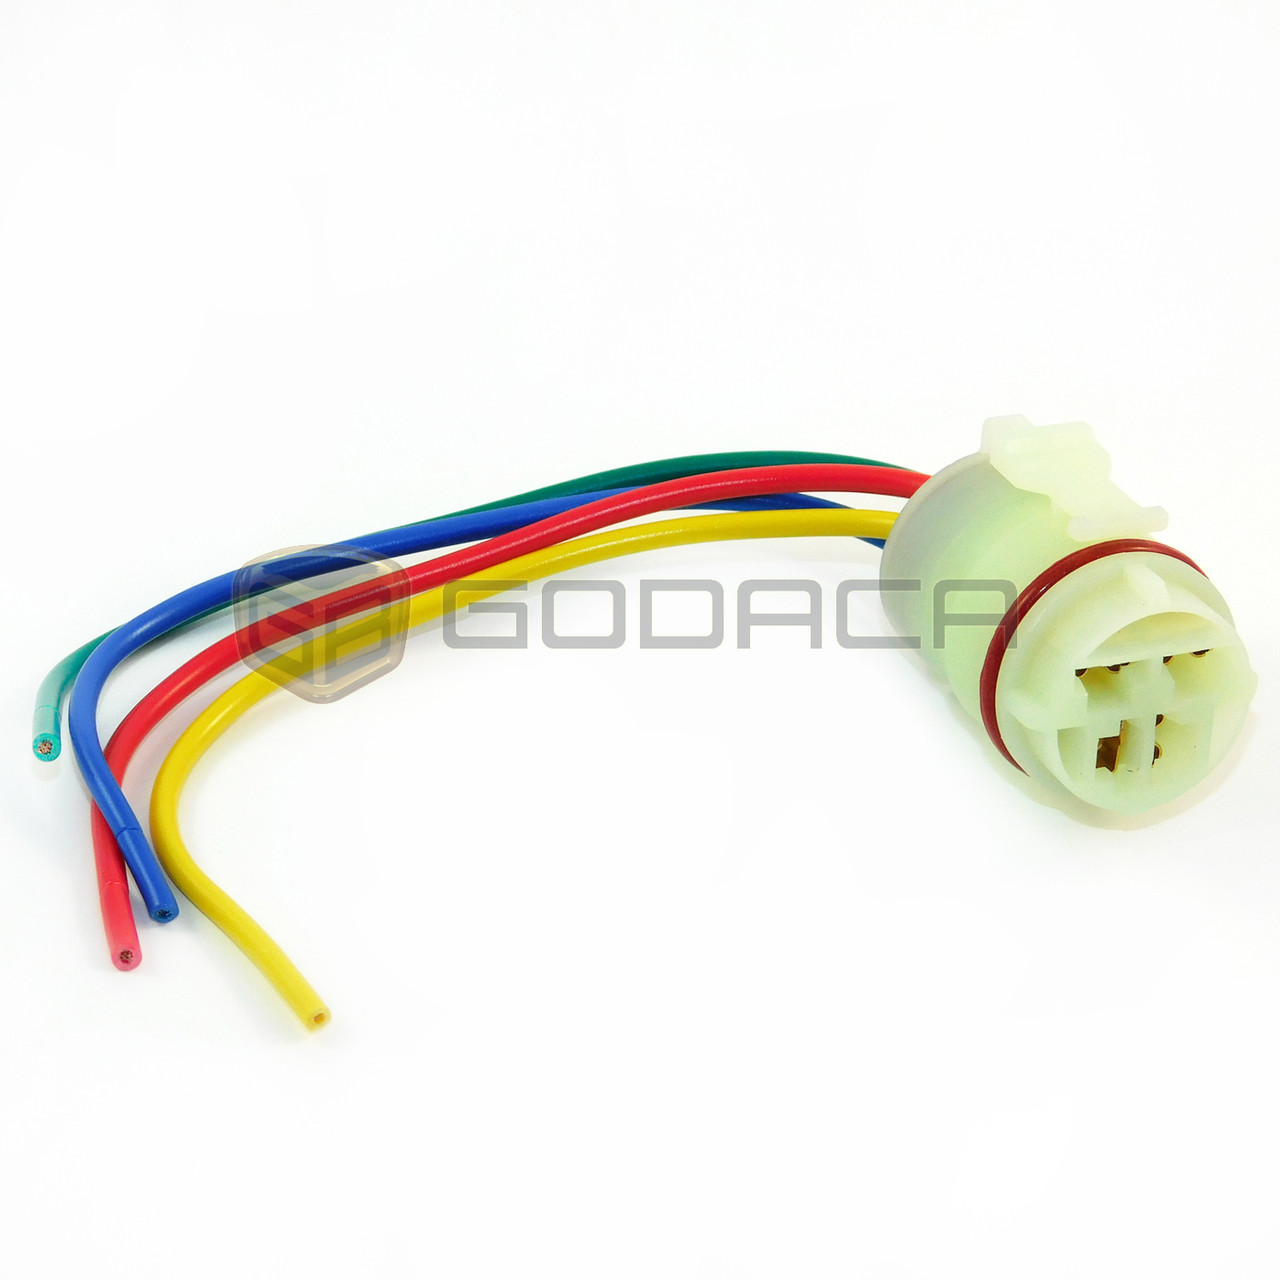 1 x 4 way connector alternator repair plug harness universal for gm gm wiring harness repair [ 1280 x 1280 Pixel ]